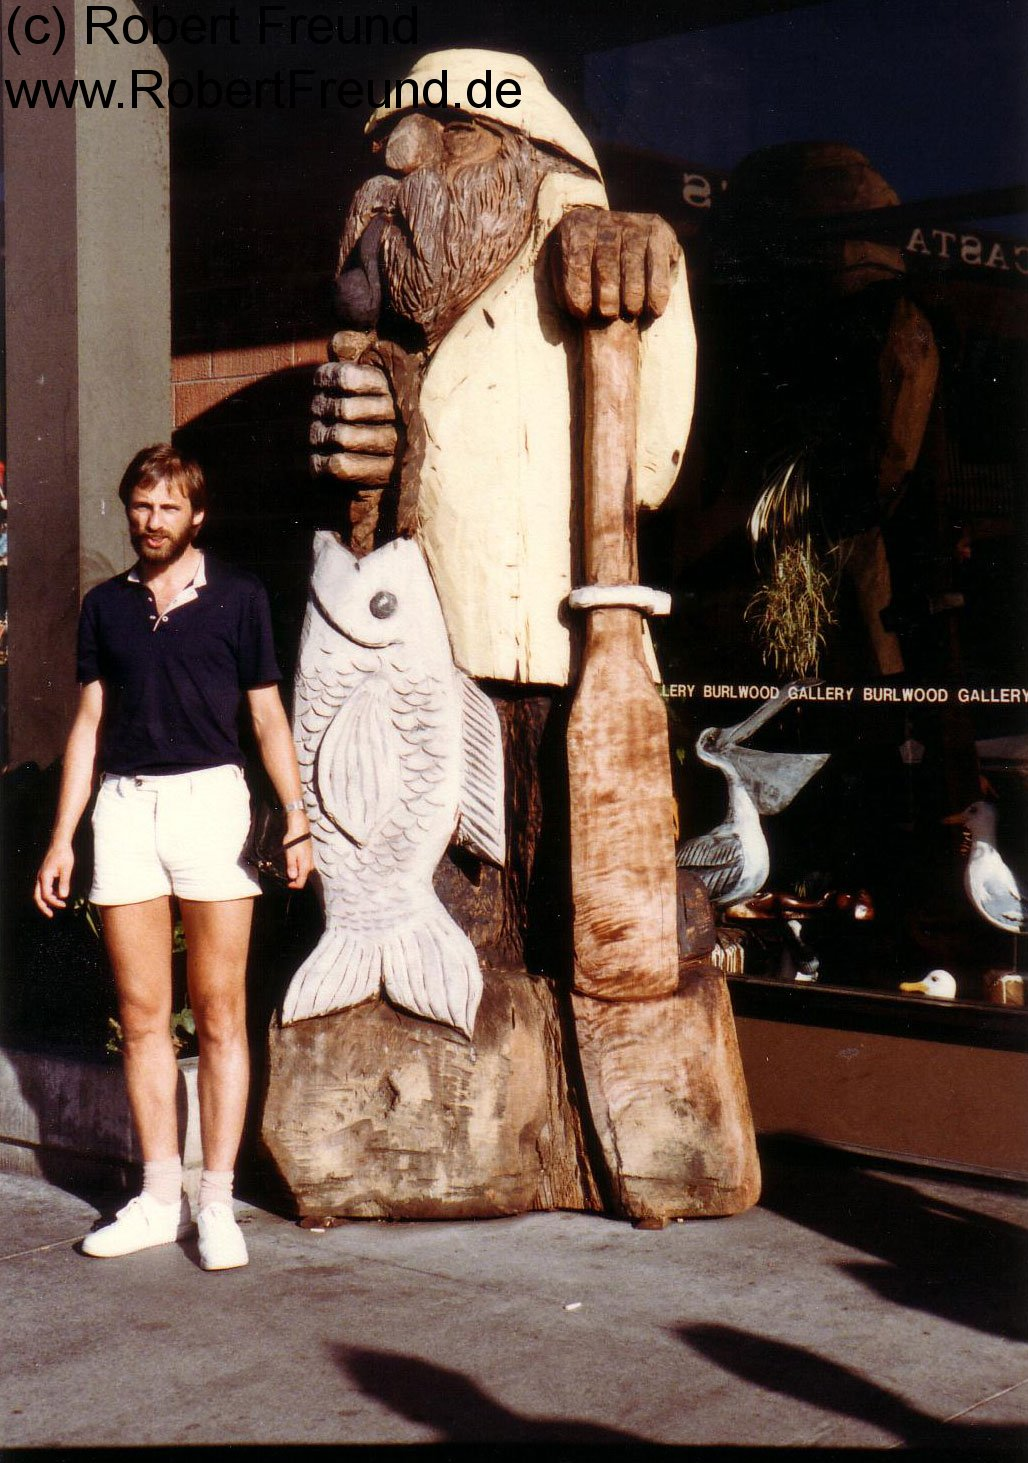 Robert-im-Guinness-Museum.jpg